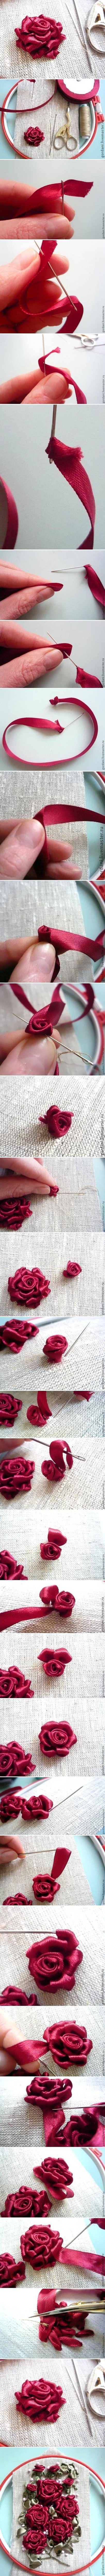 Multi-layered Ribbon Rose Picture Tutorial...